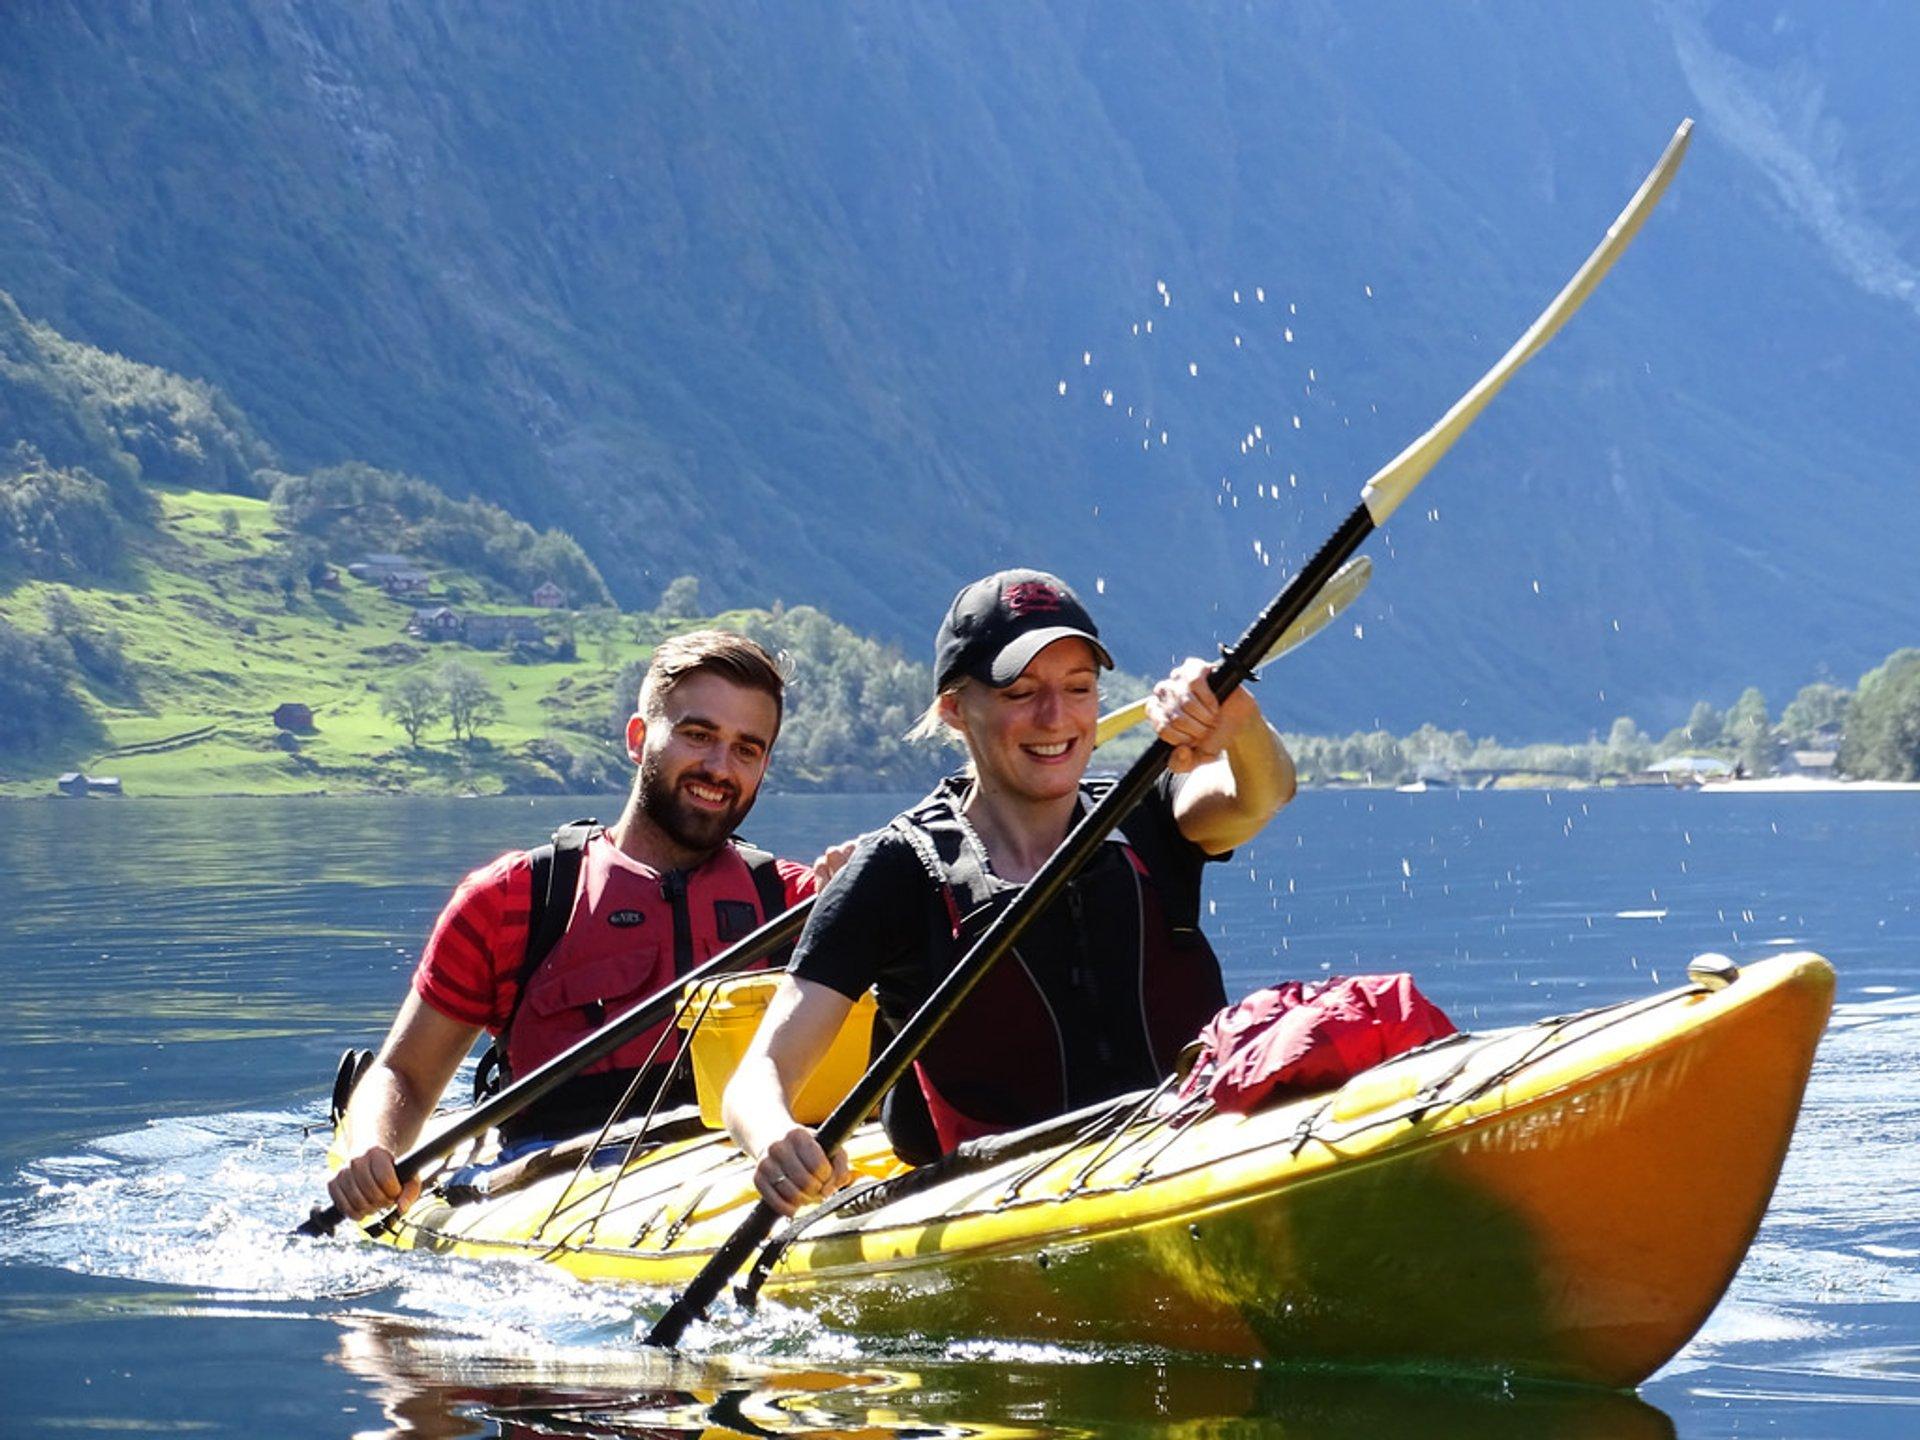 Glacier Lake Kayaking in Norway - Best Season 2020